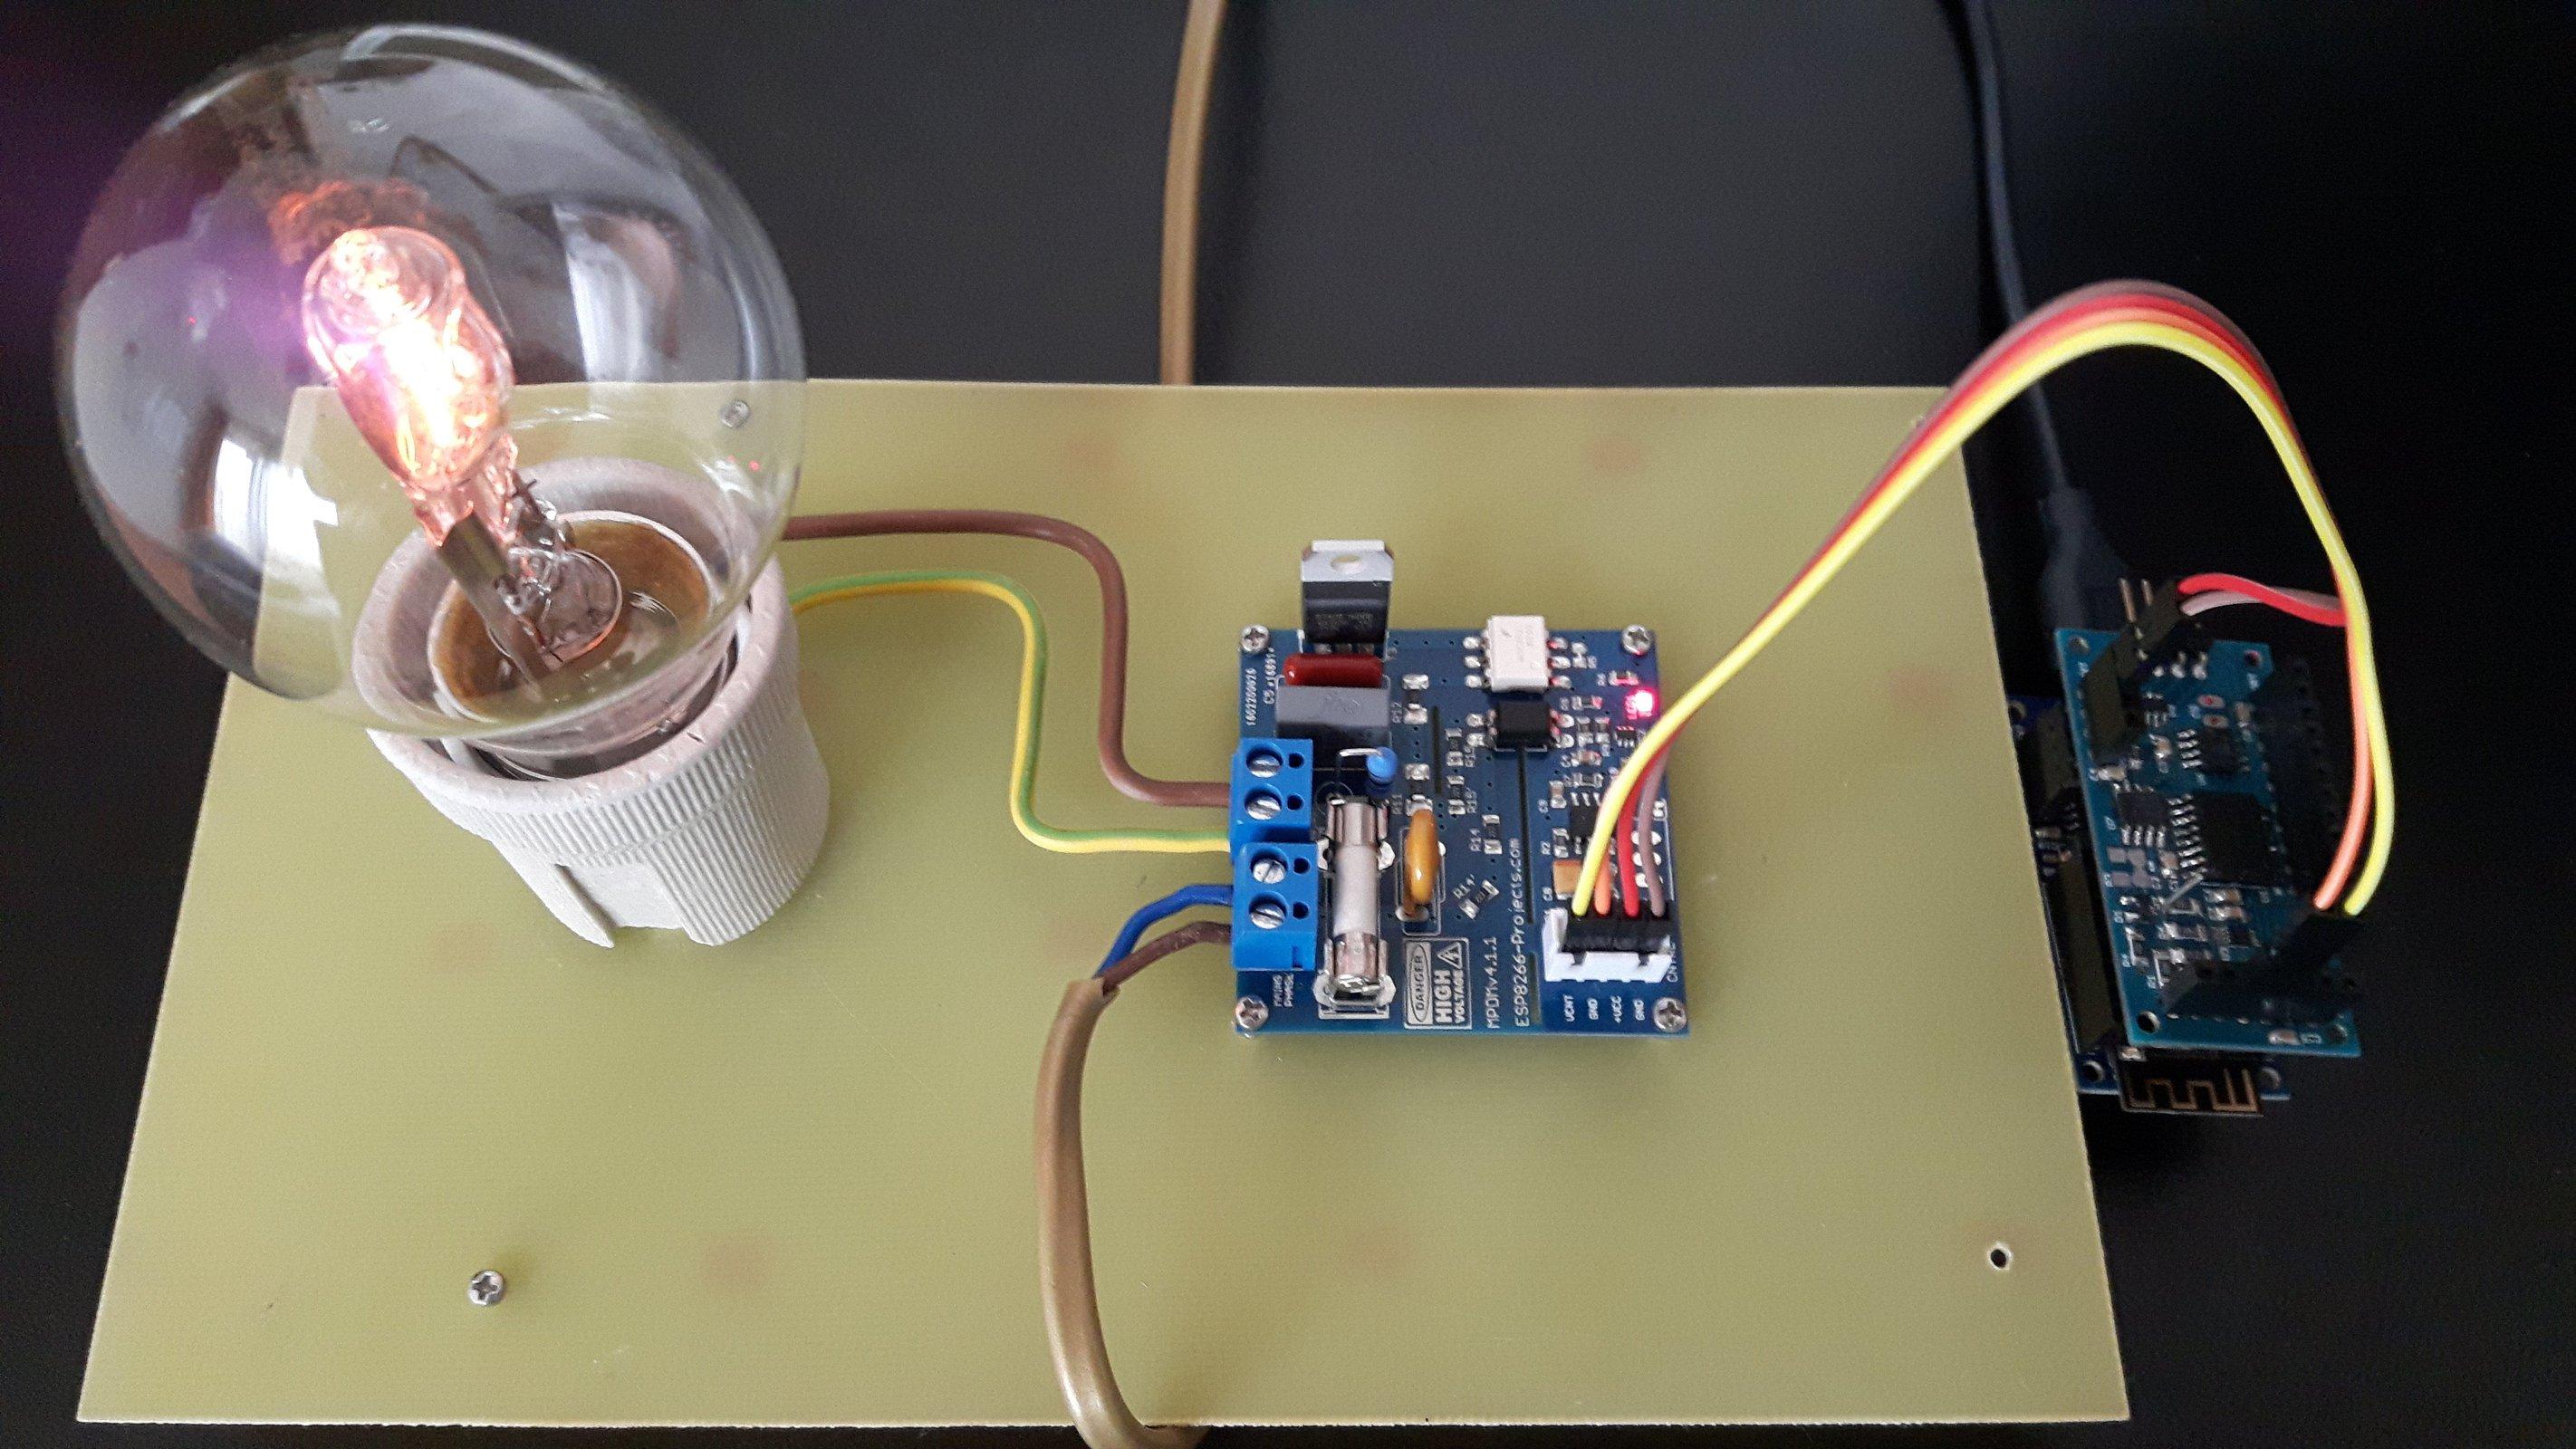 Universal Ac Mains Dimmer Mpdmv41 From Nextevo On Tindie Arduino Light Circuits Circuit Scr 3